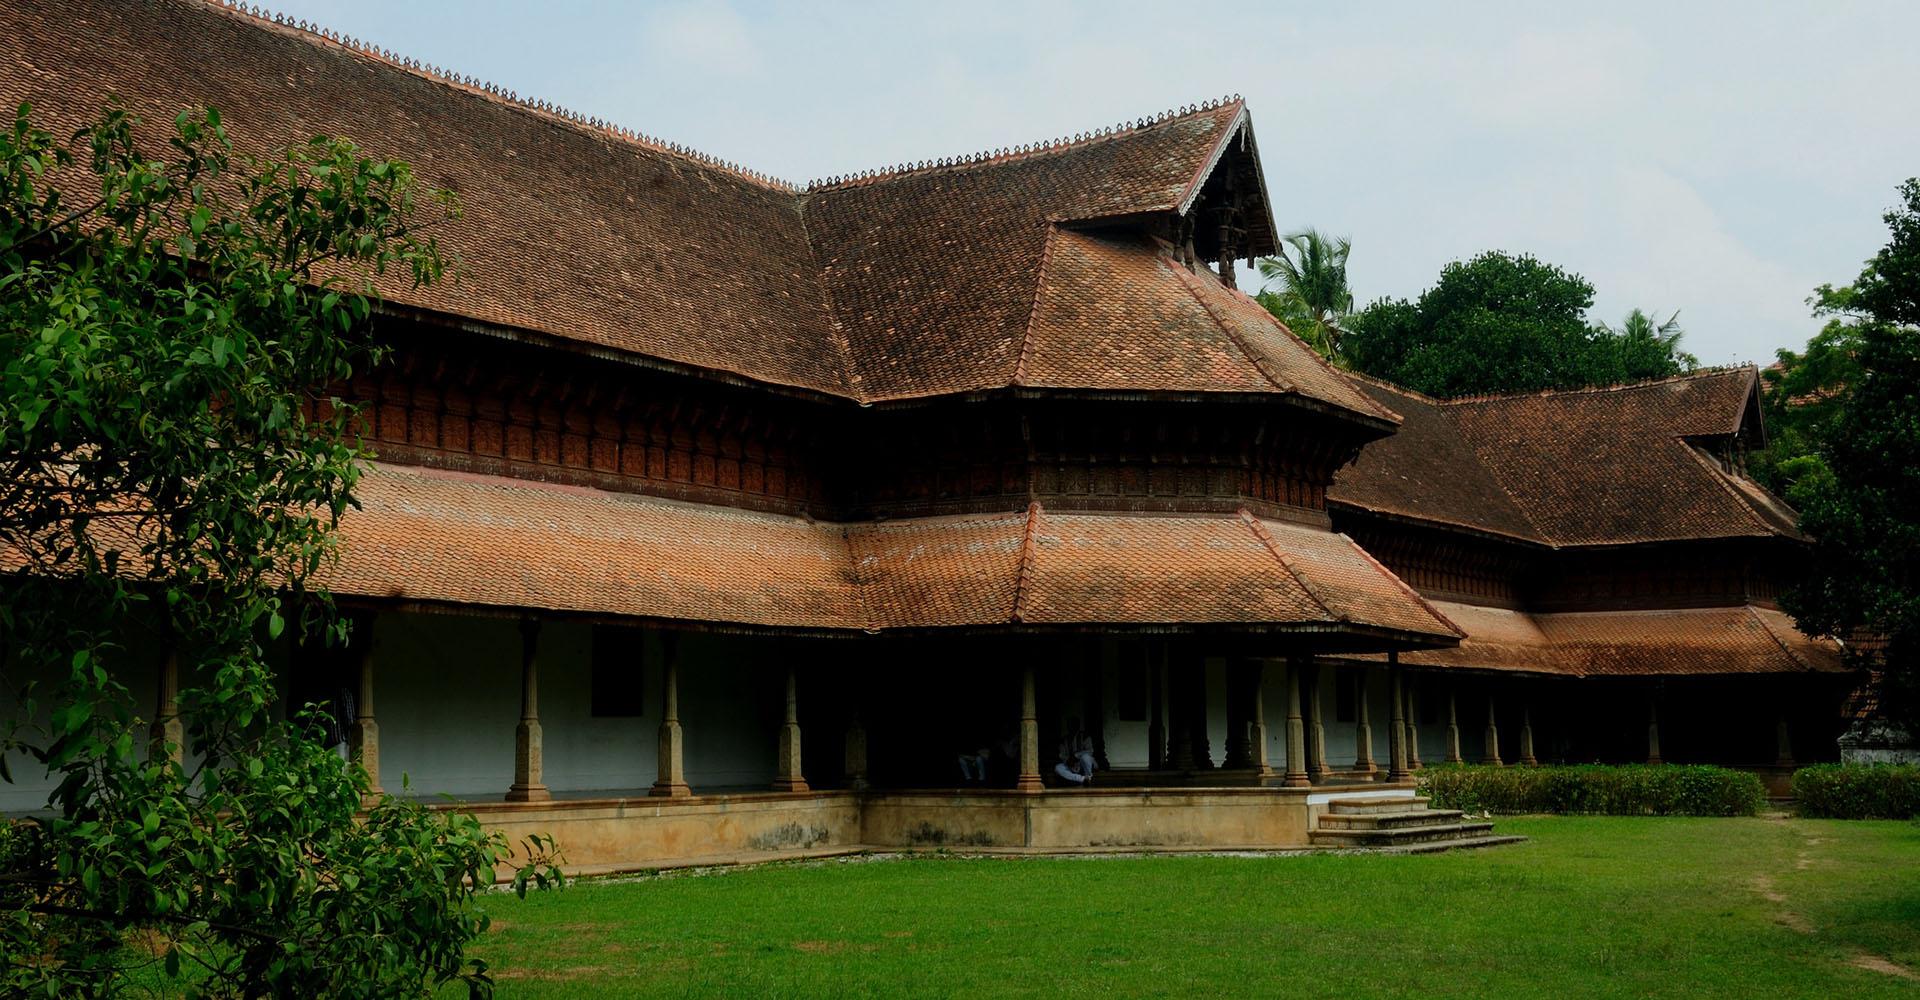 Trivandrum – Where Travancore still lives on